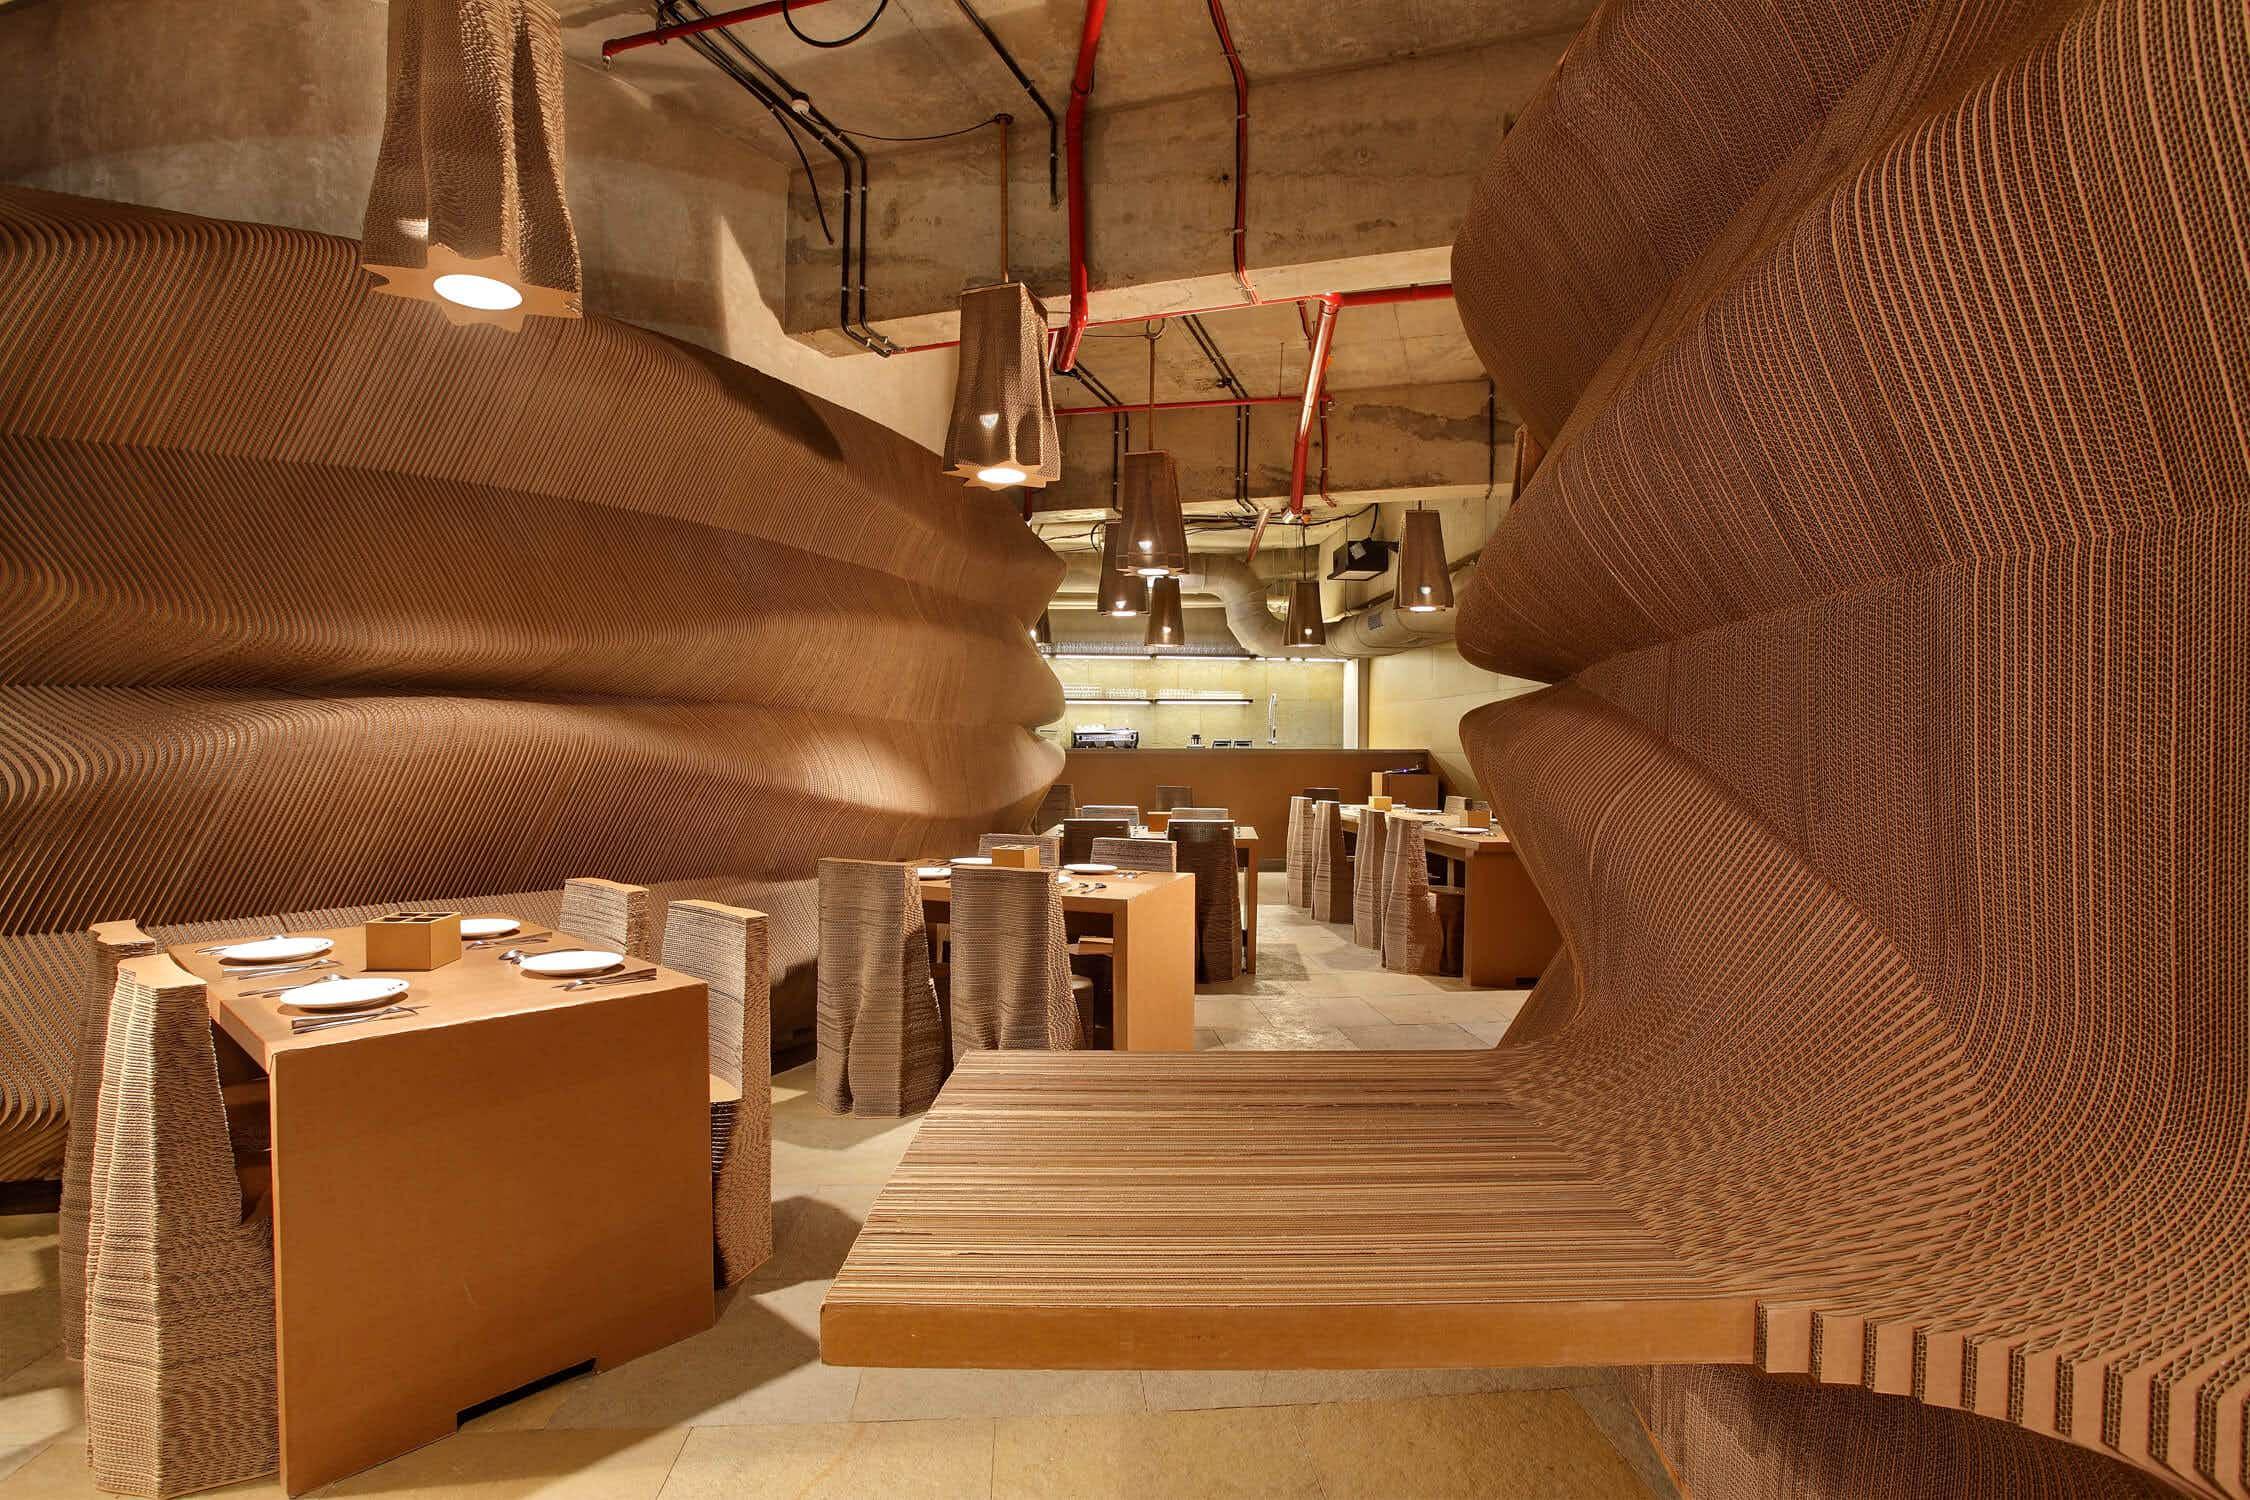 Inside the eco-designed Mumbai cafe made of cardboard